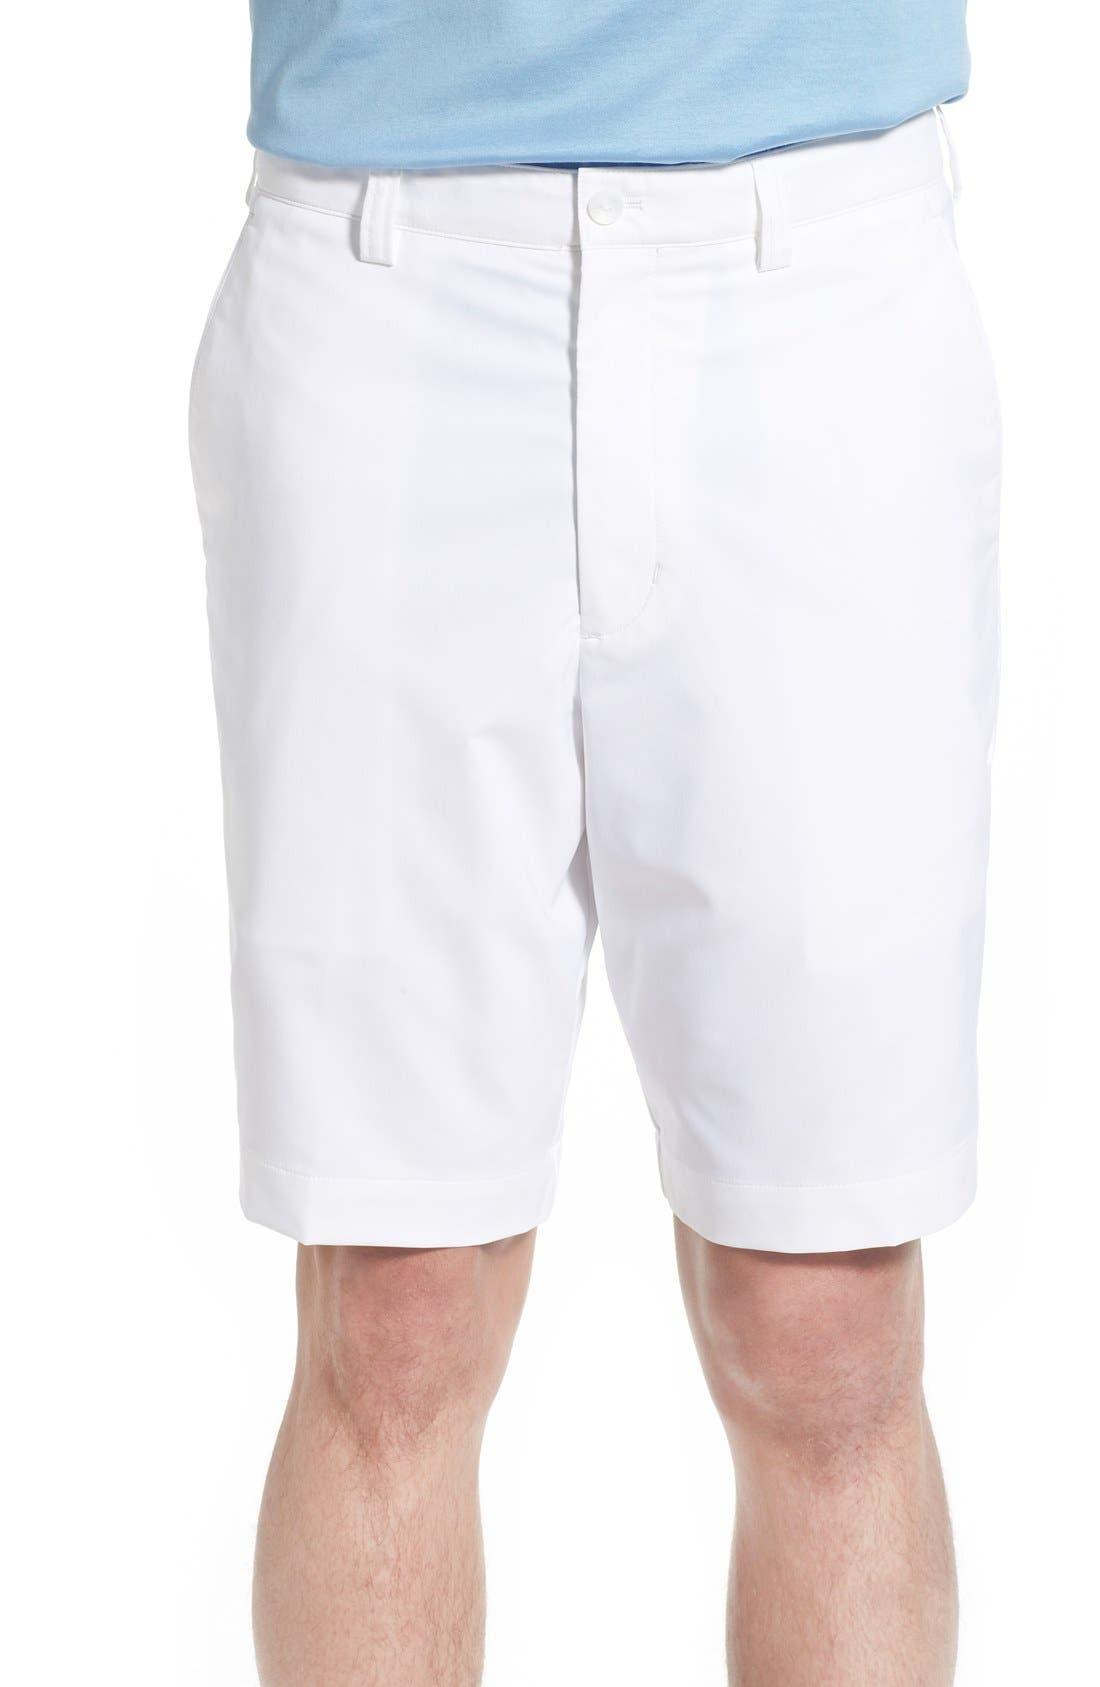 DryTec Shorts,                         Main,                         color, WHITE